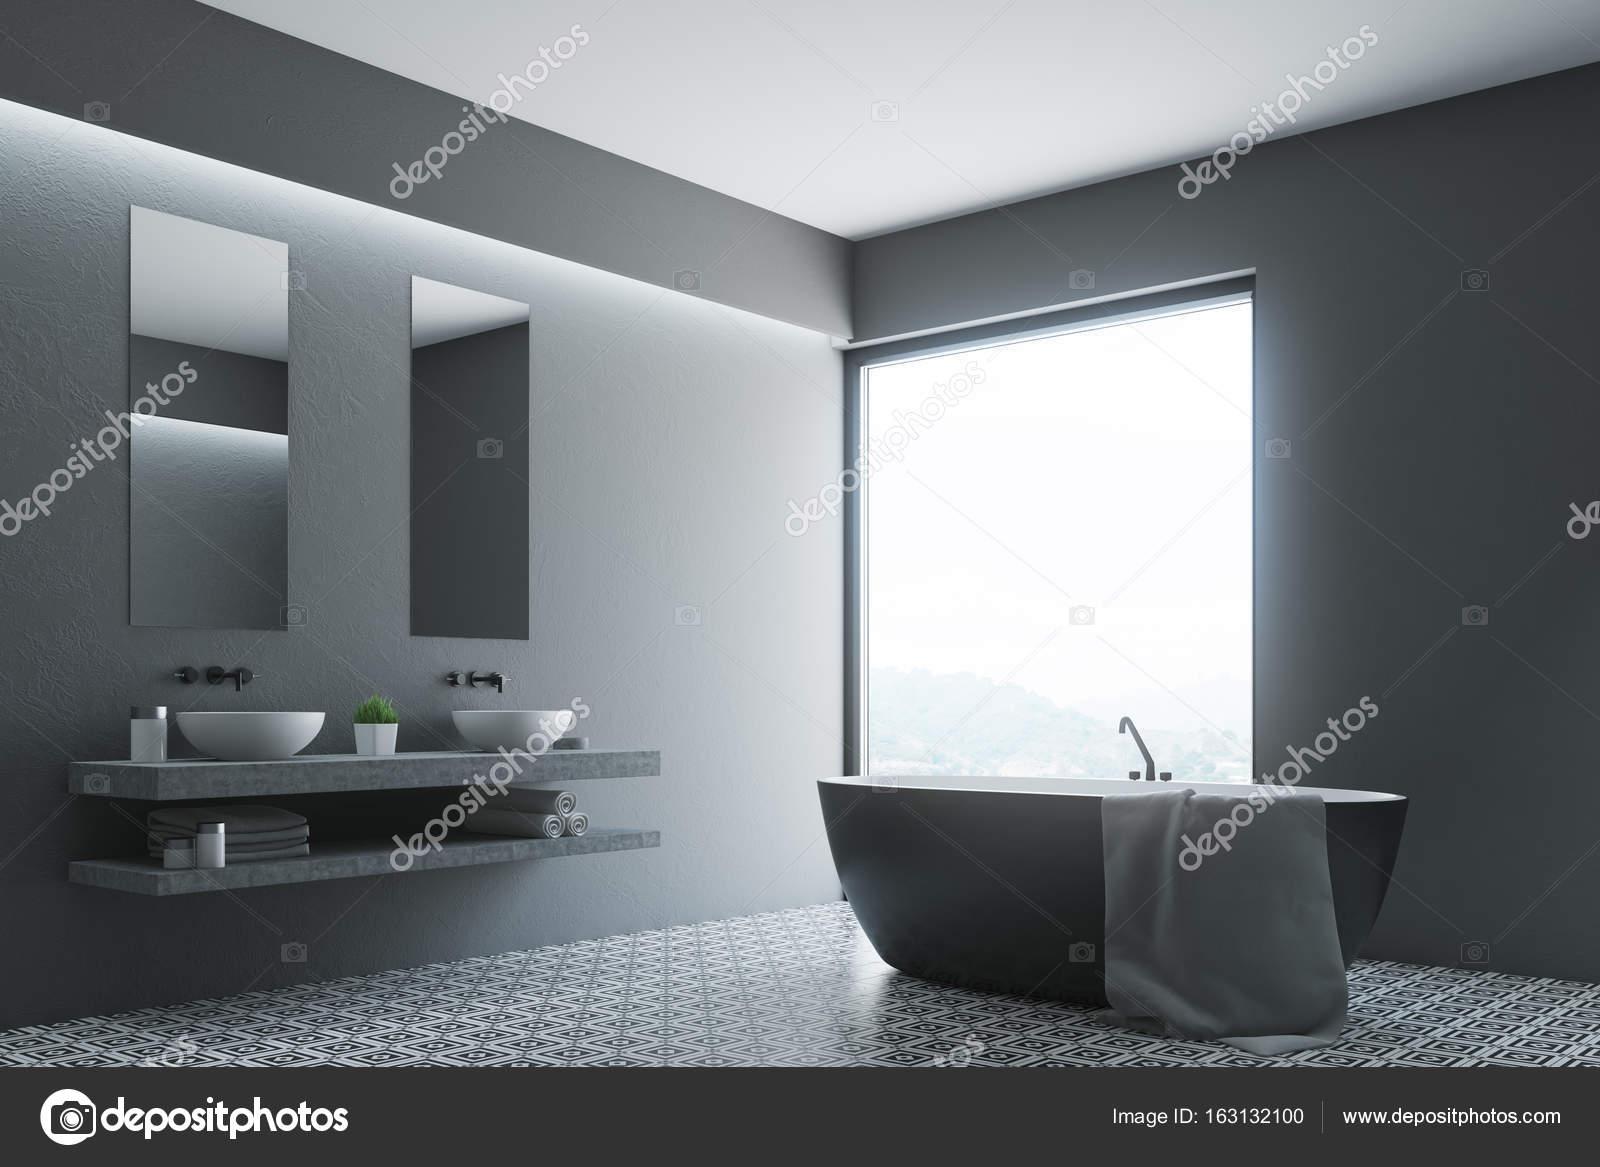 Bagno grigio rotonda vasca angolo poster foto stock denisismagilov 163132100 - Vasca da bagno grigia ...